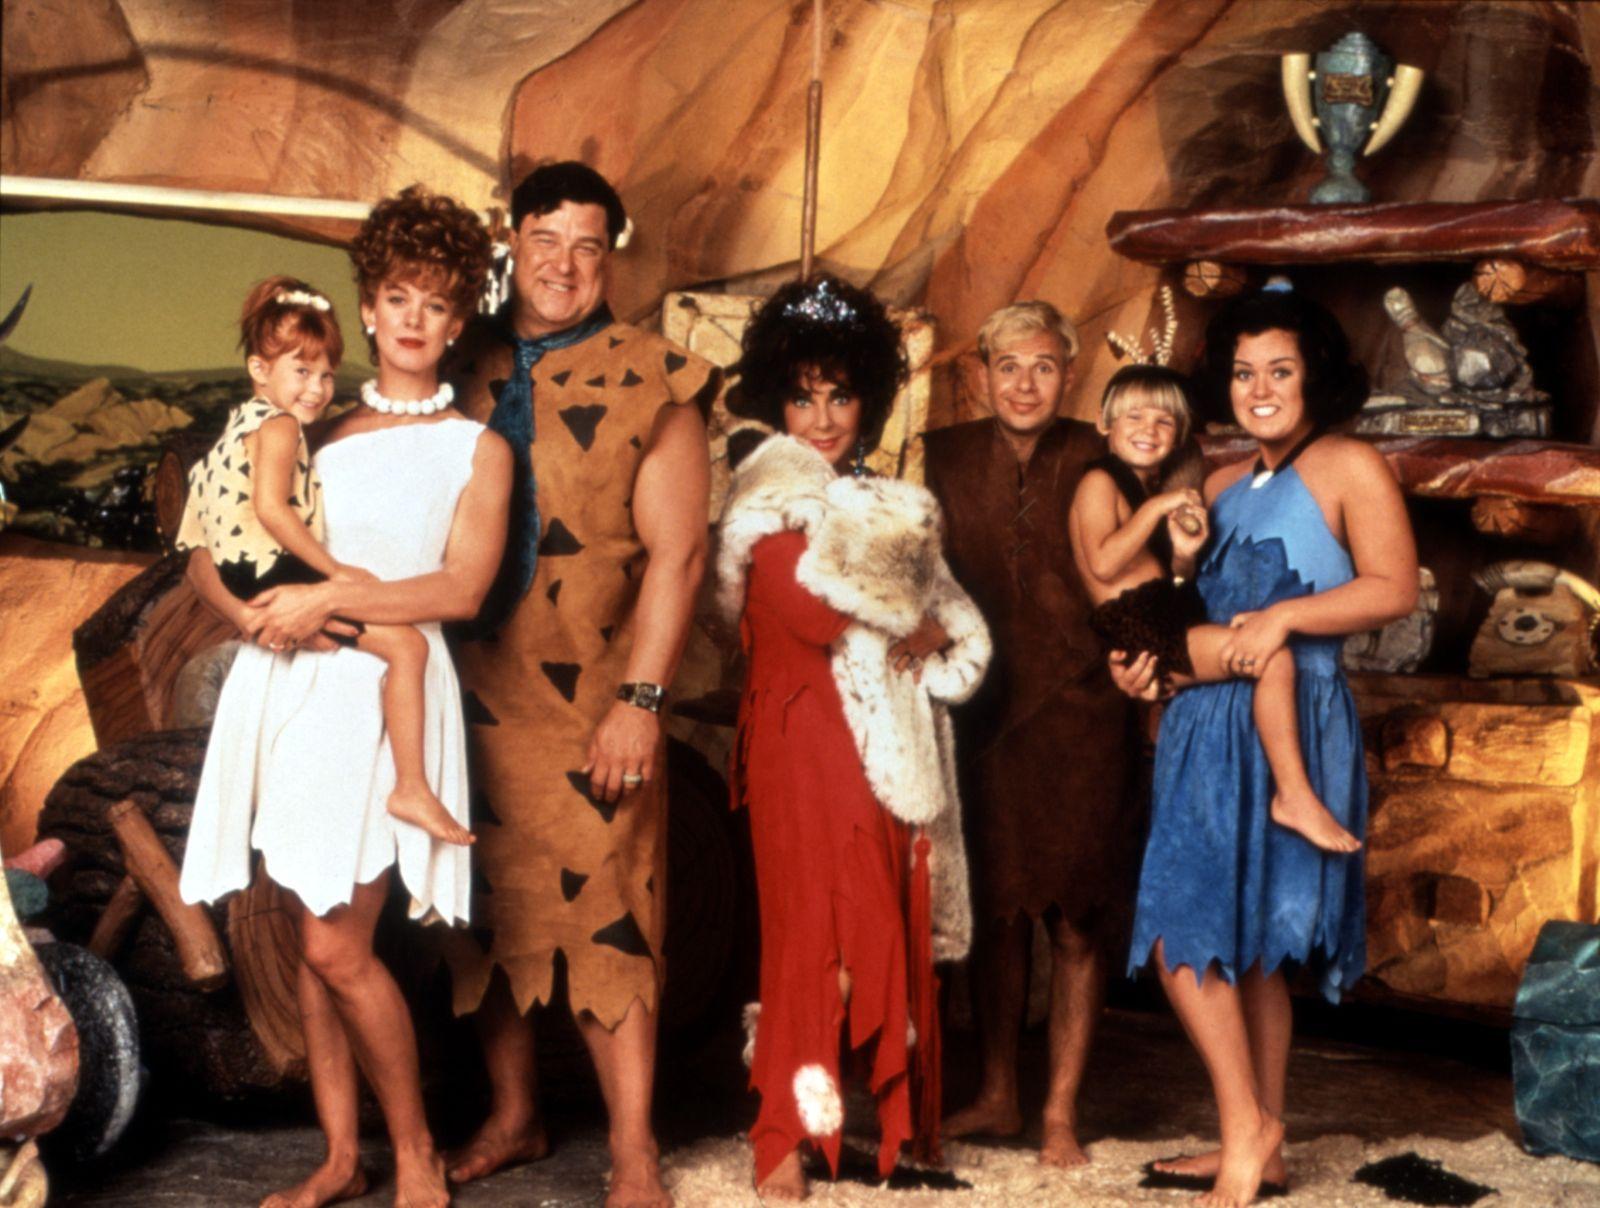 THE FLINTSTONES, Elaine/Melanie Silver, Elizabeth Perkins, John Goodman, Elizabeth Taylor, Rick Mora